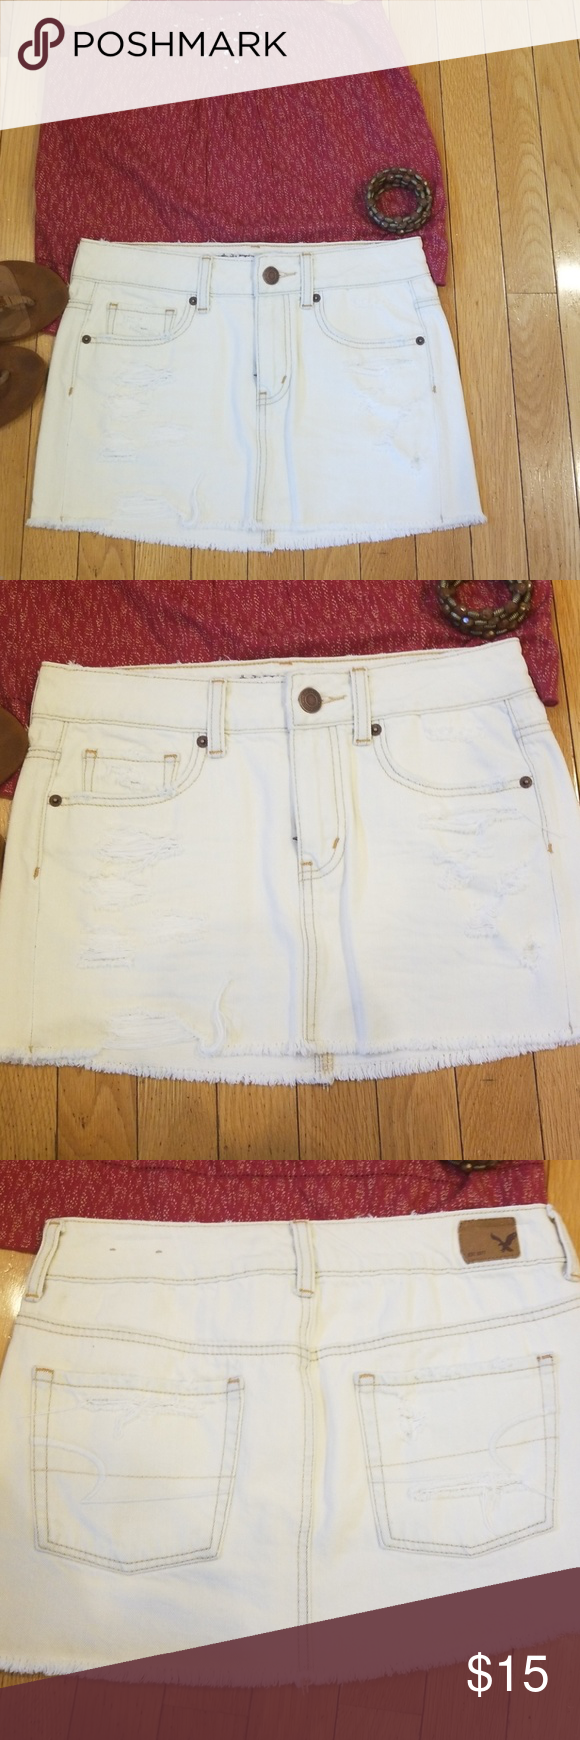 c1b8b6626ec890 Button Up Jean Skirt American Eagle – DACC